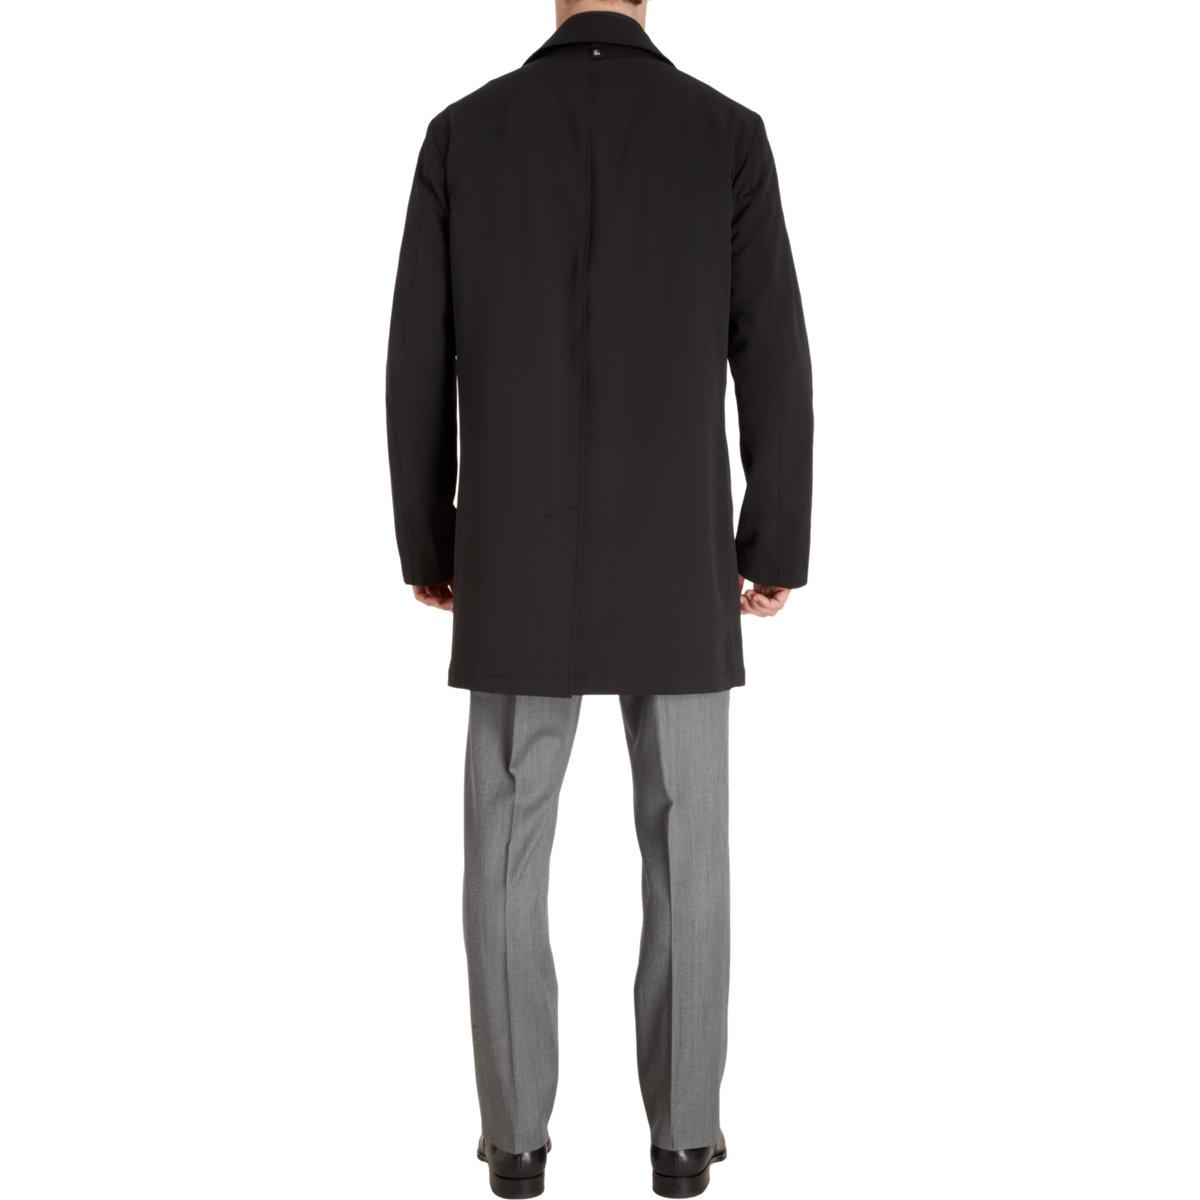 Black Tailored Coat Mackintosh 0003 Wool Noir qEUtxrwq